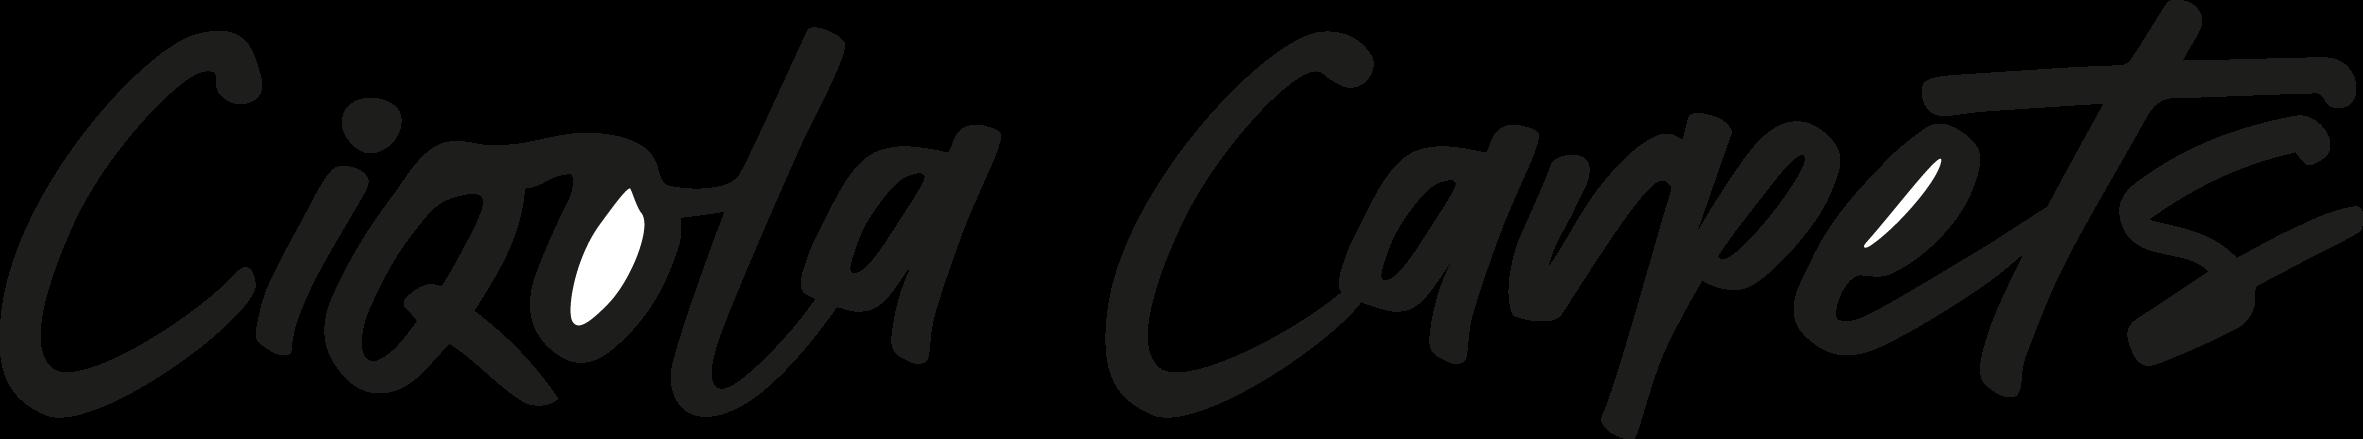 Ciqola-Carpets-logo.png